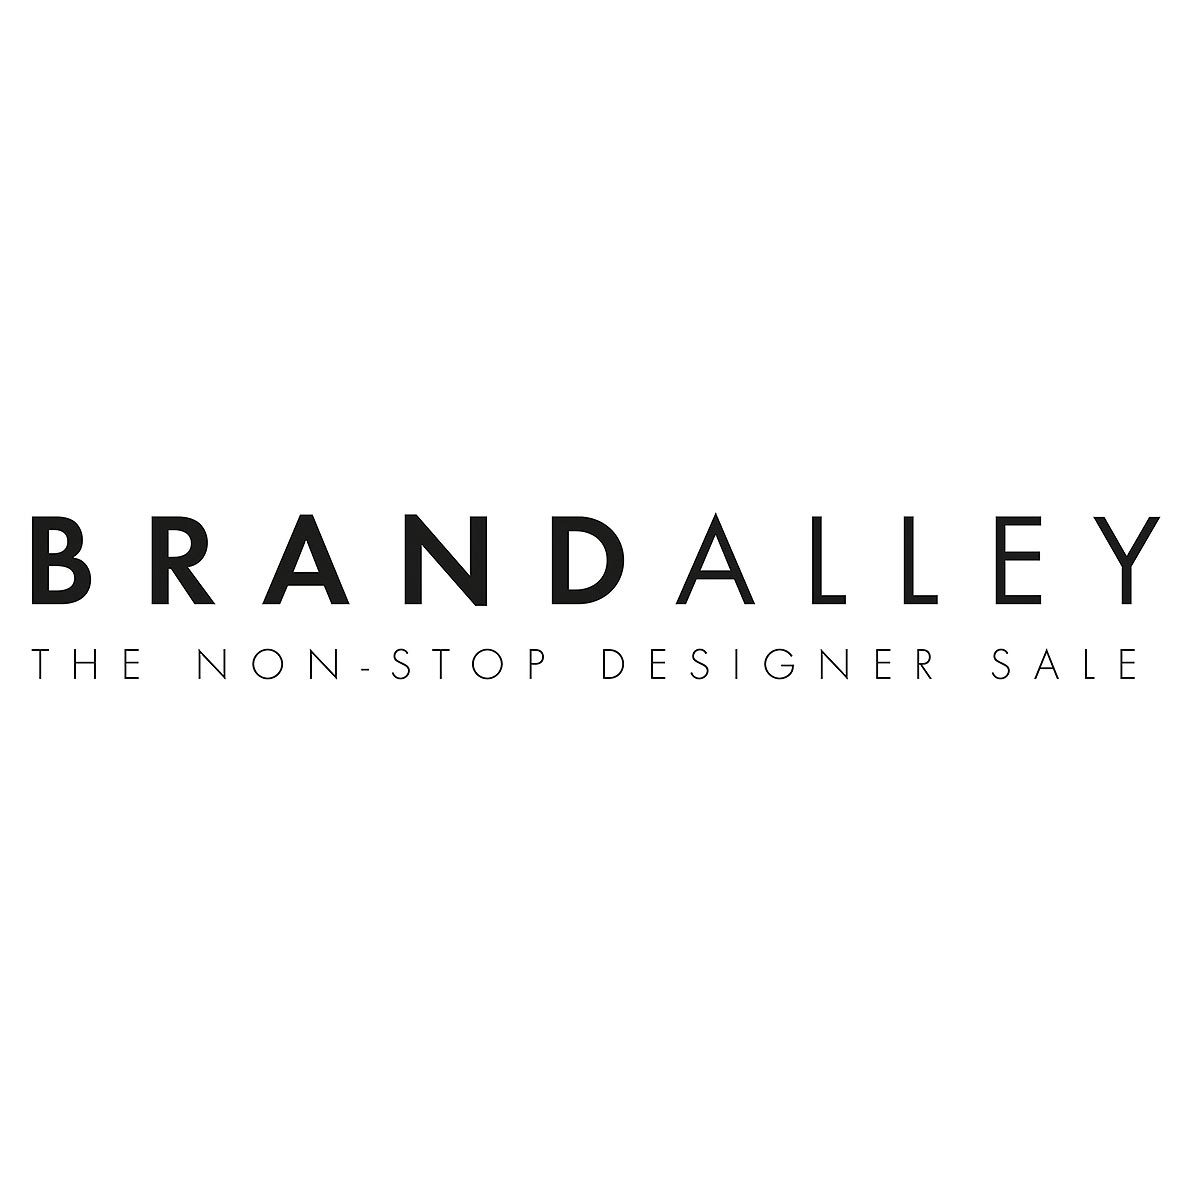 brandalley referral code